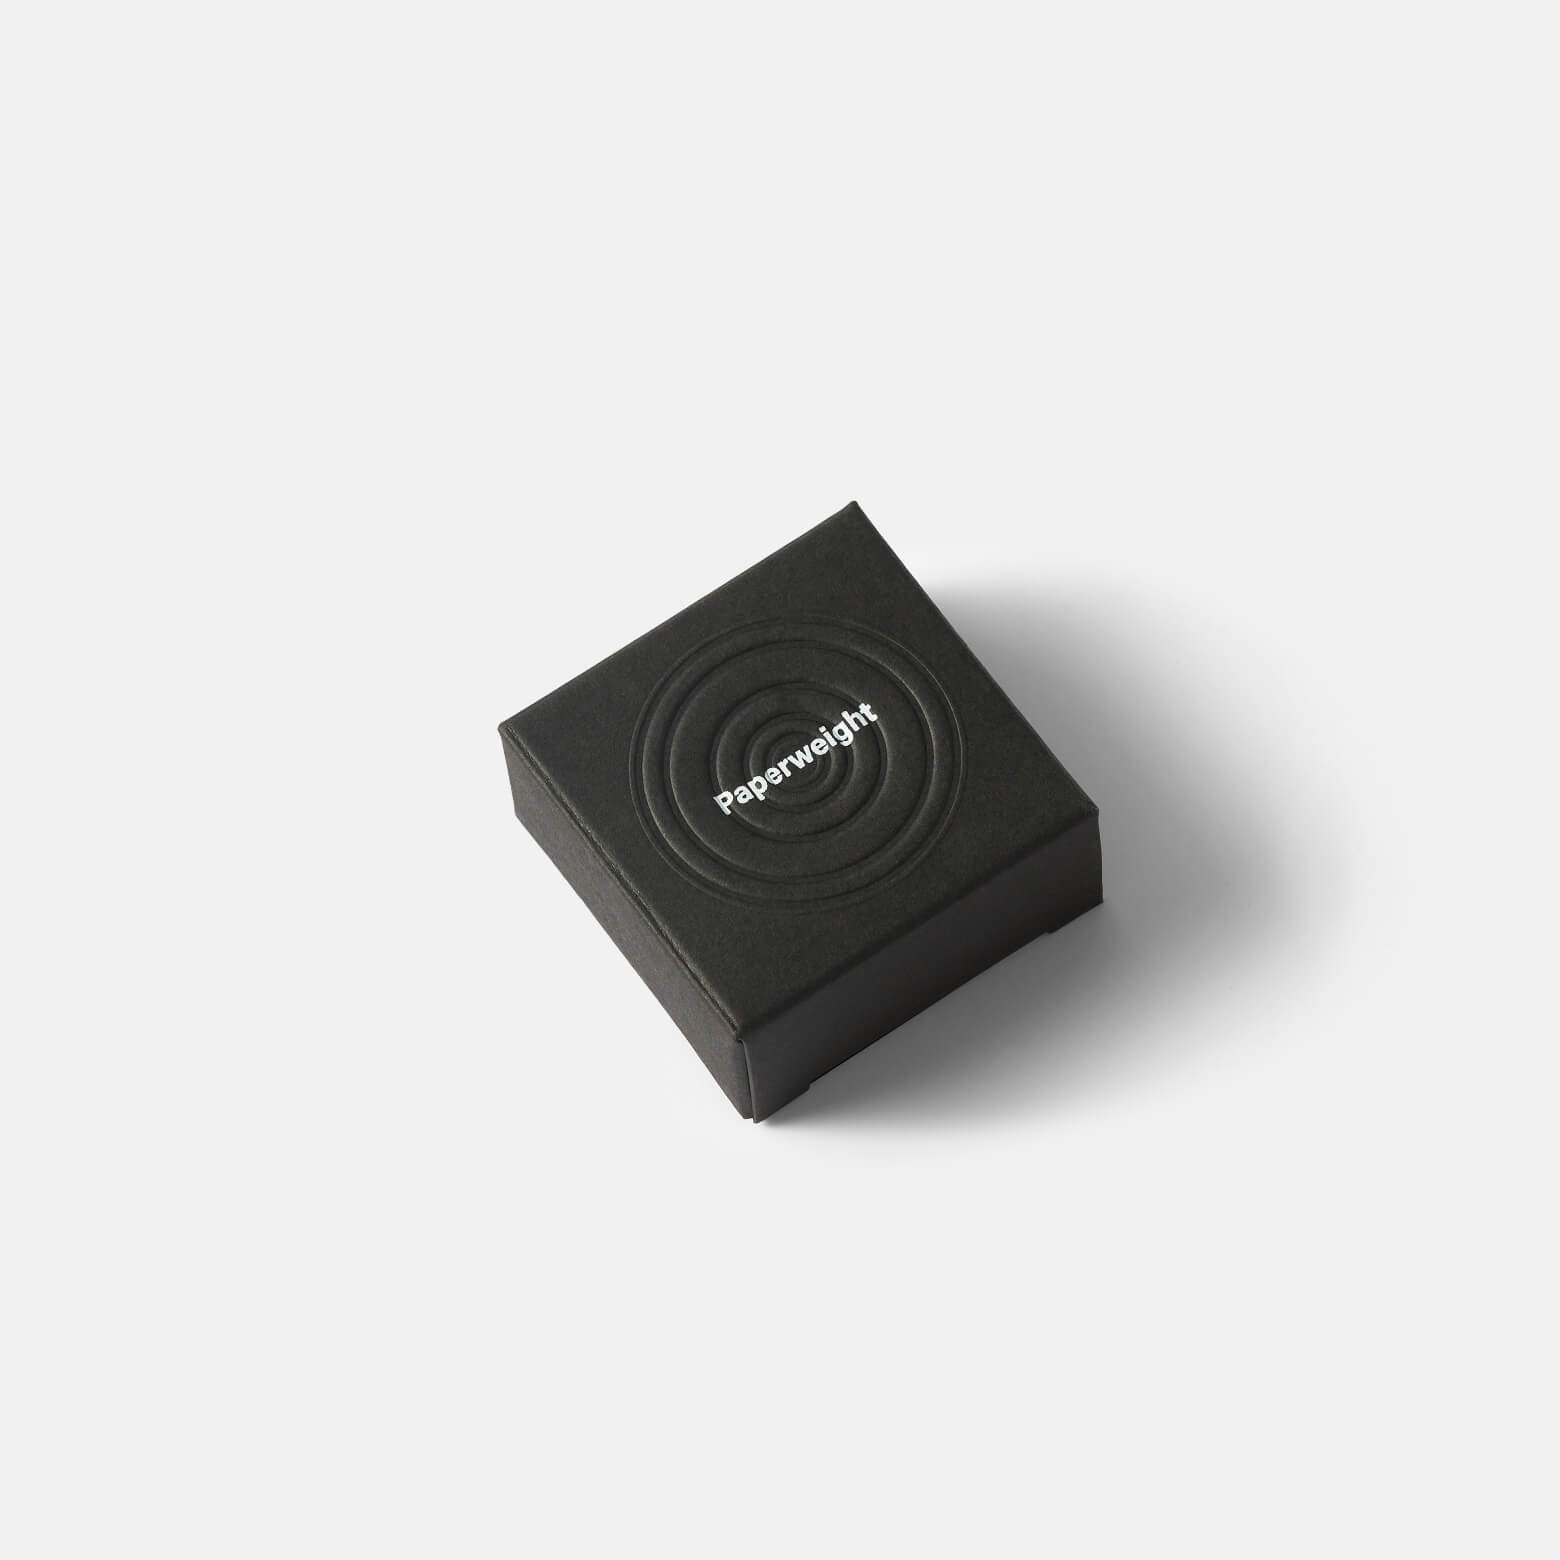 Paperweight — подставка пресс-папье